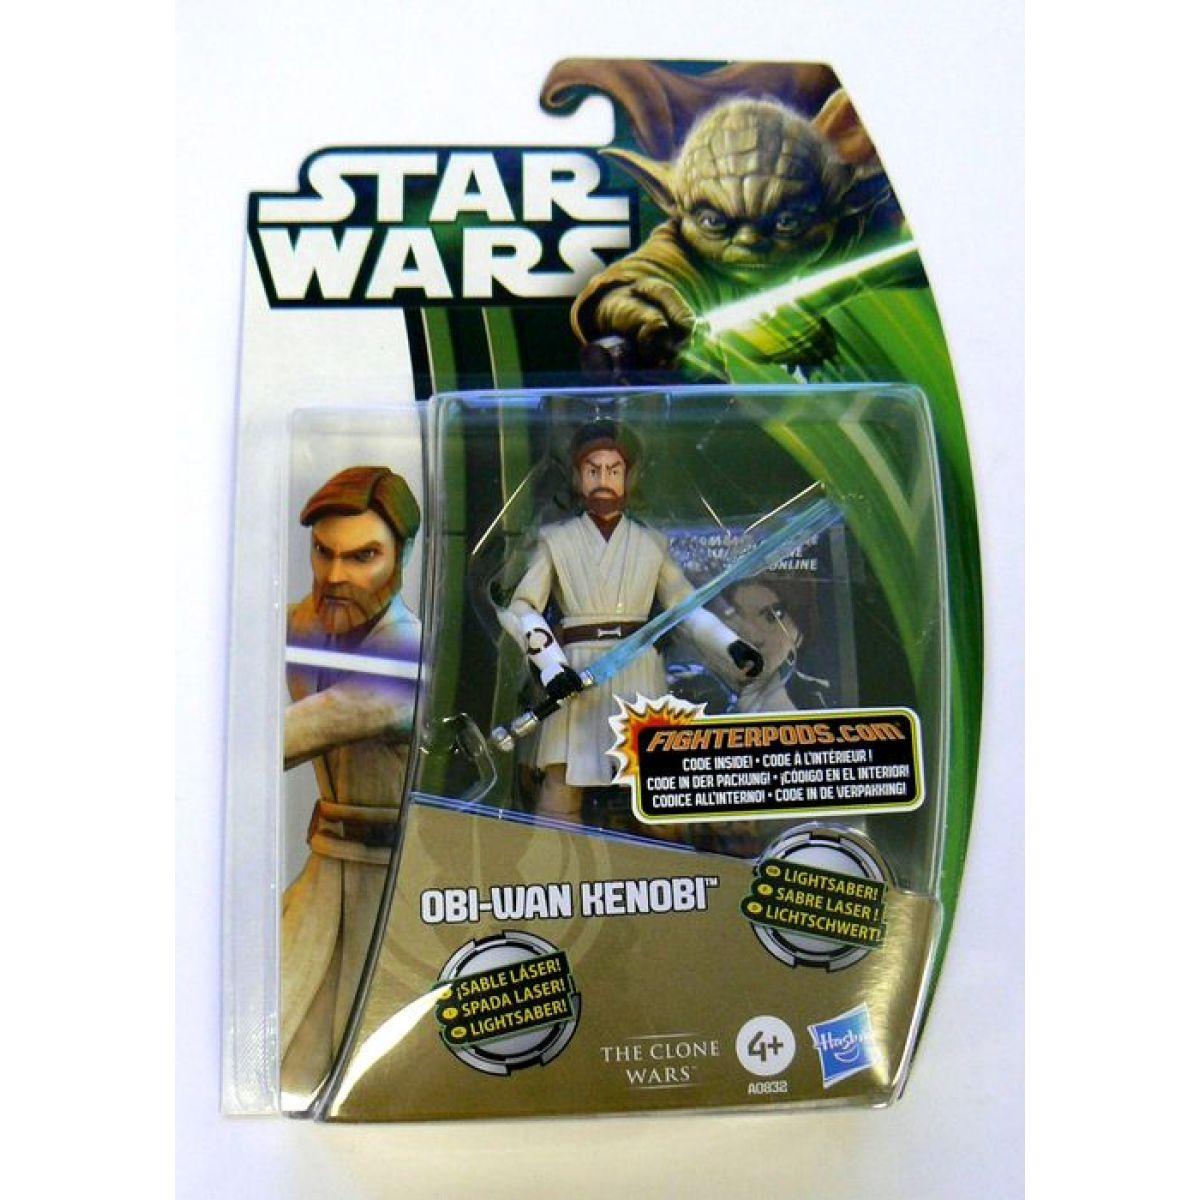 Star Wars figurky clone wars Hasbro 37290 - Obi-Wan Kenobi